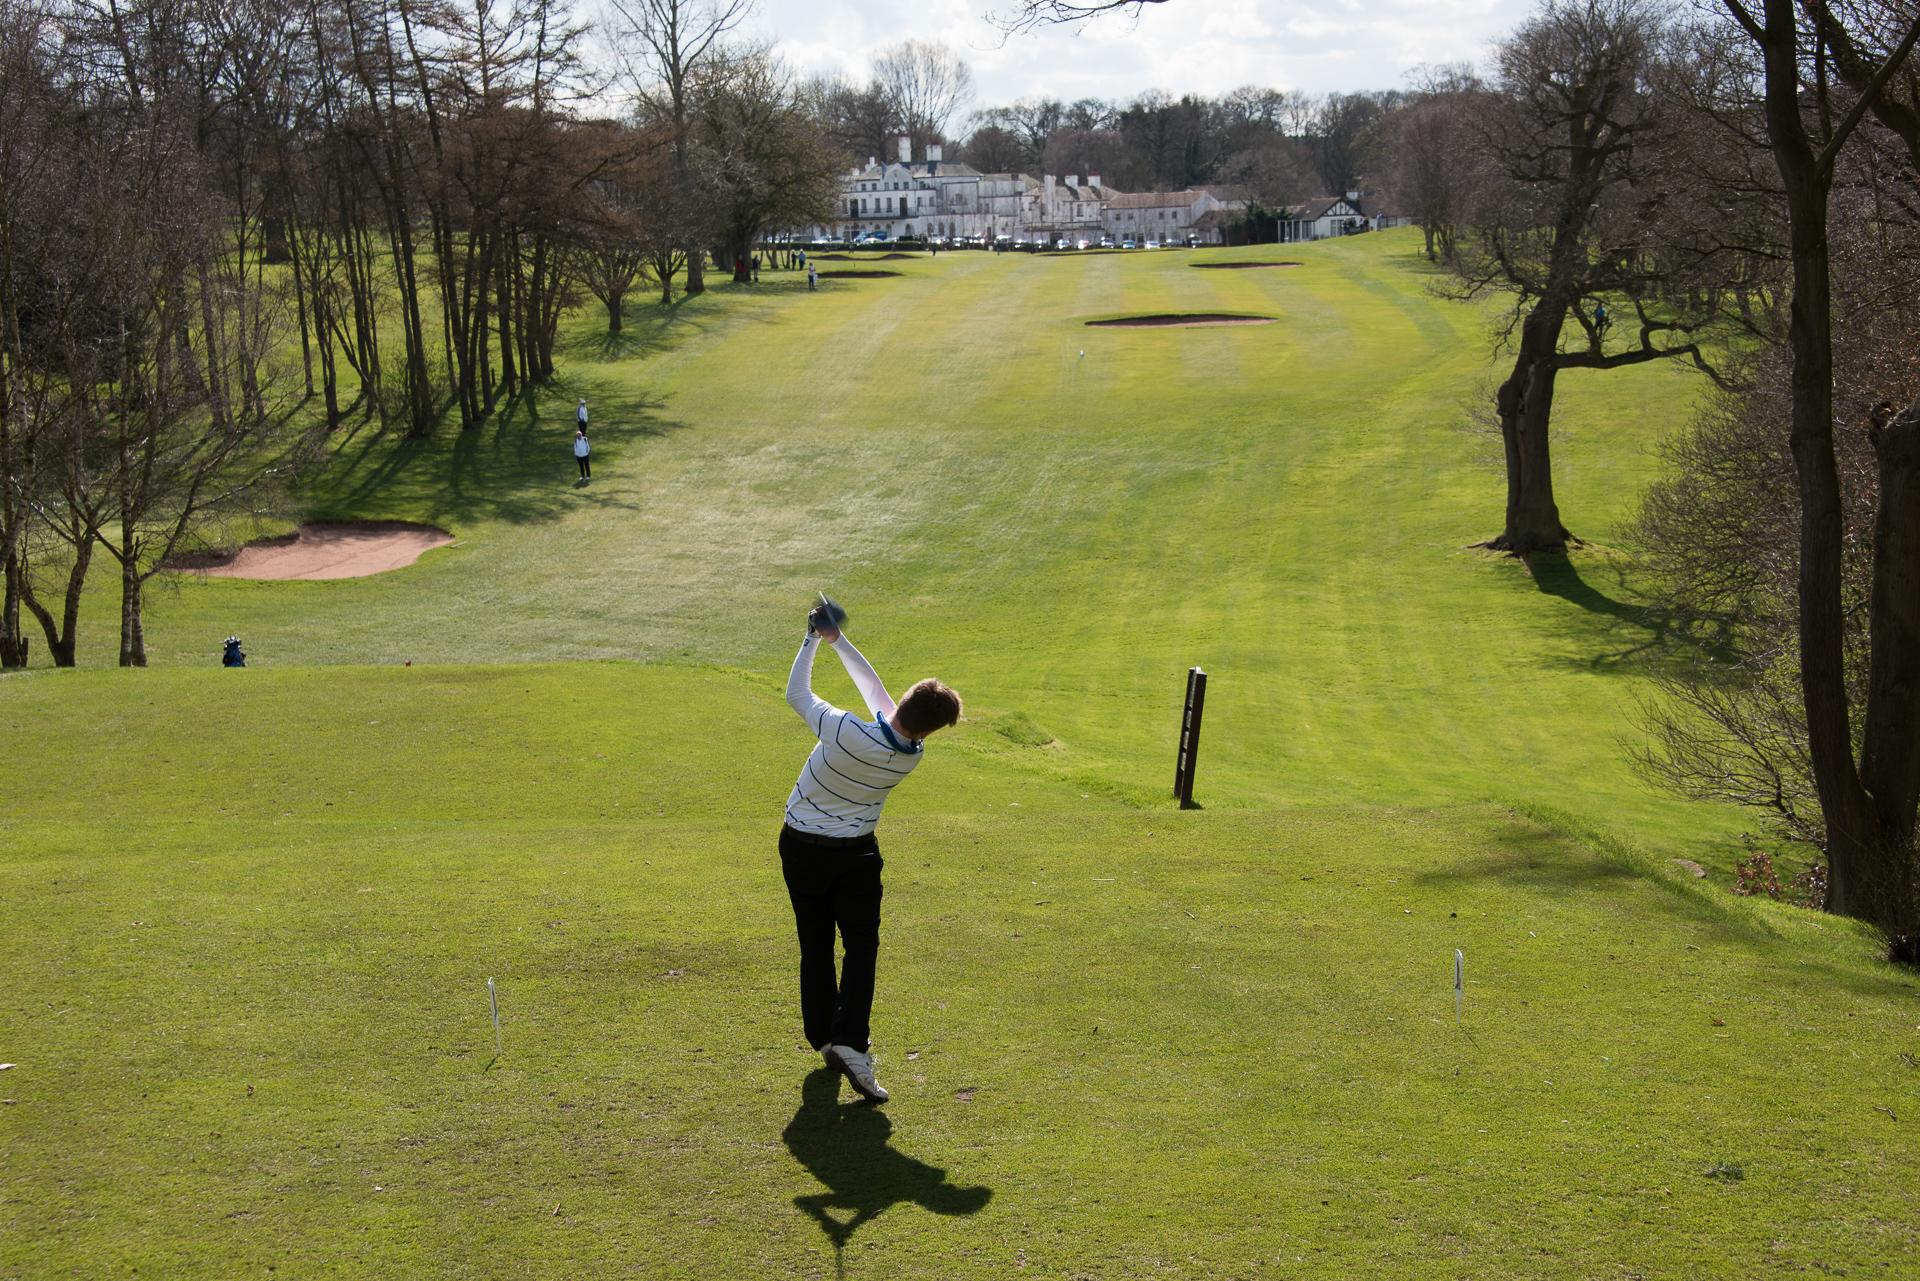 Kevindiss.com golf course photography Hawkstone Park golf course-2757.jpg